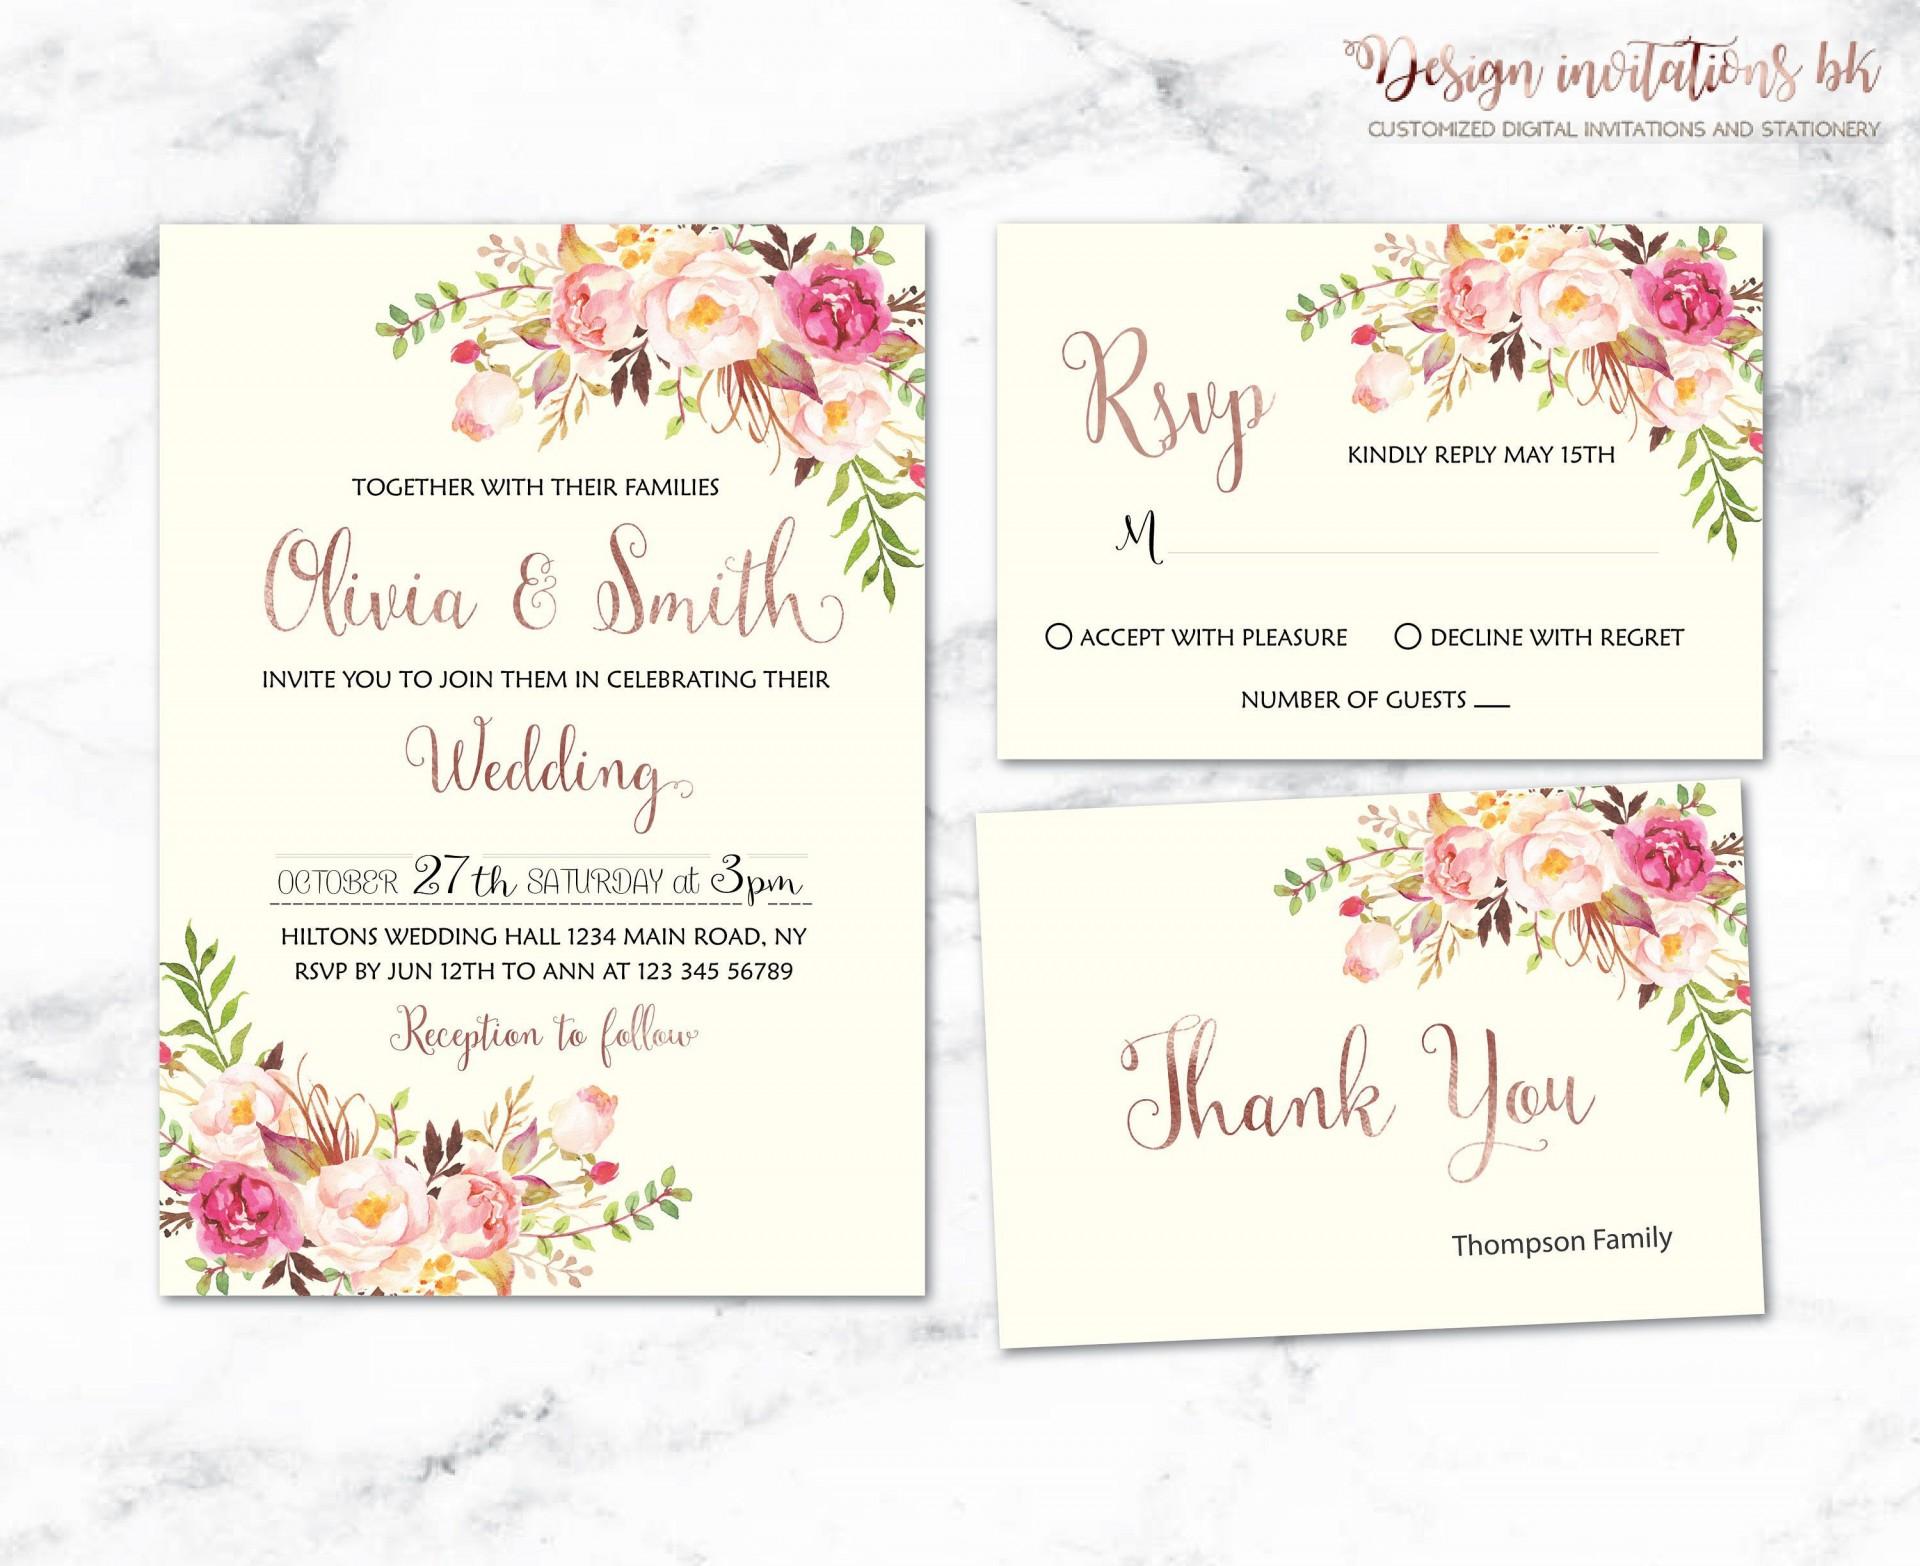 001 Unusual Sample Wedding Invitation Template Design  Templates Wording Card1920